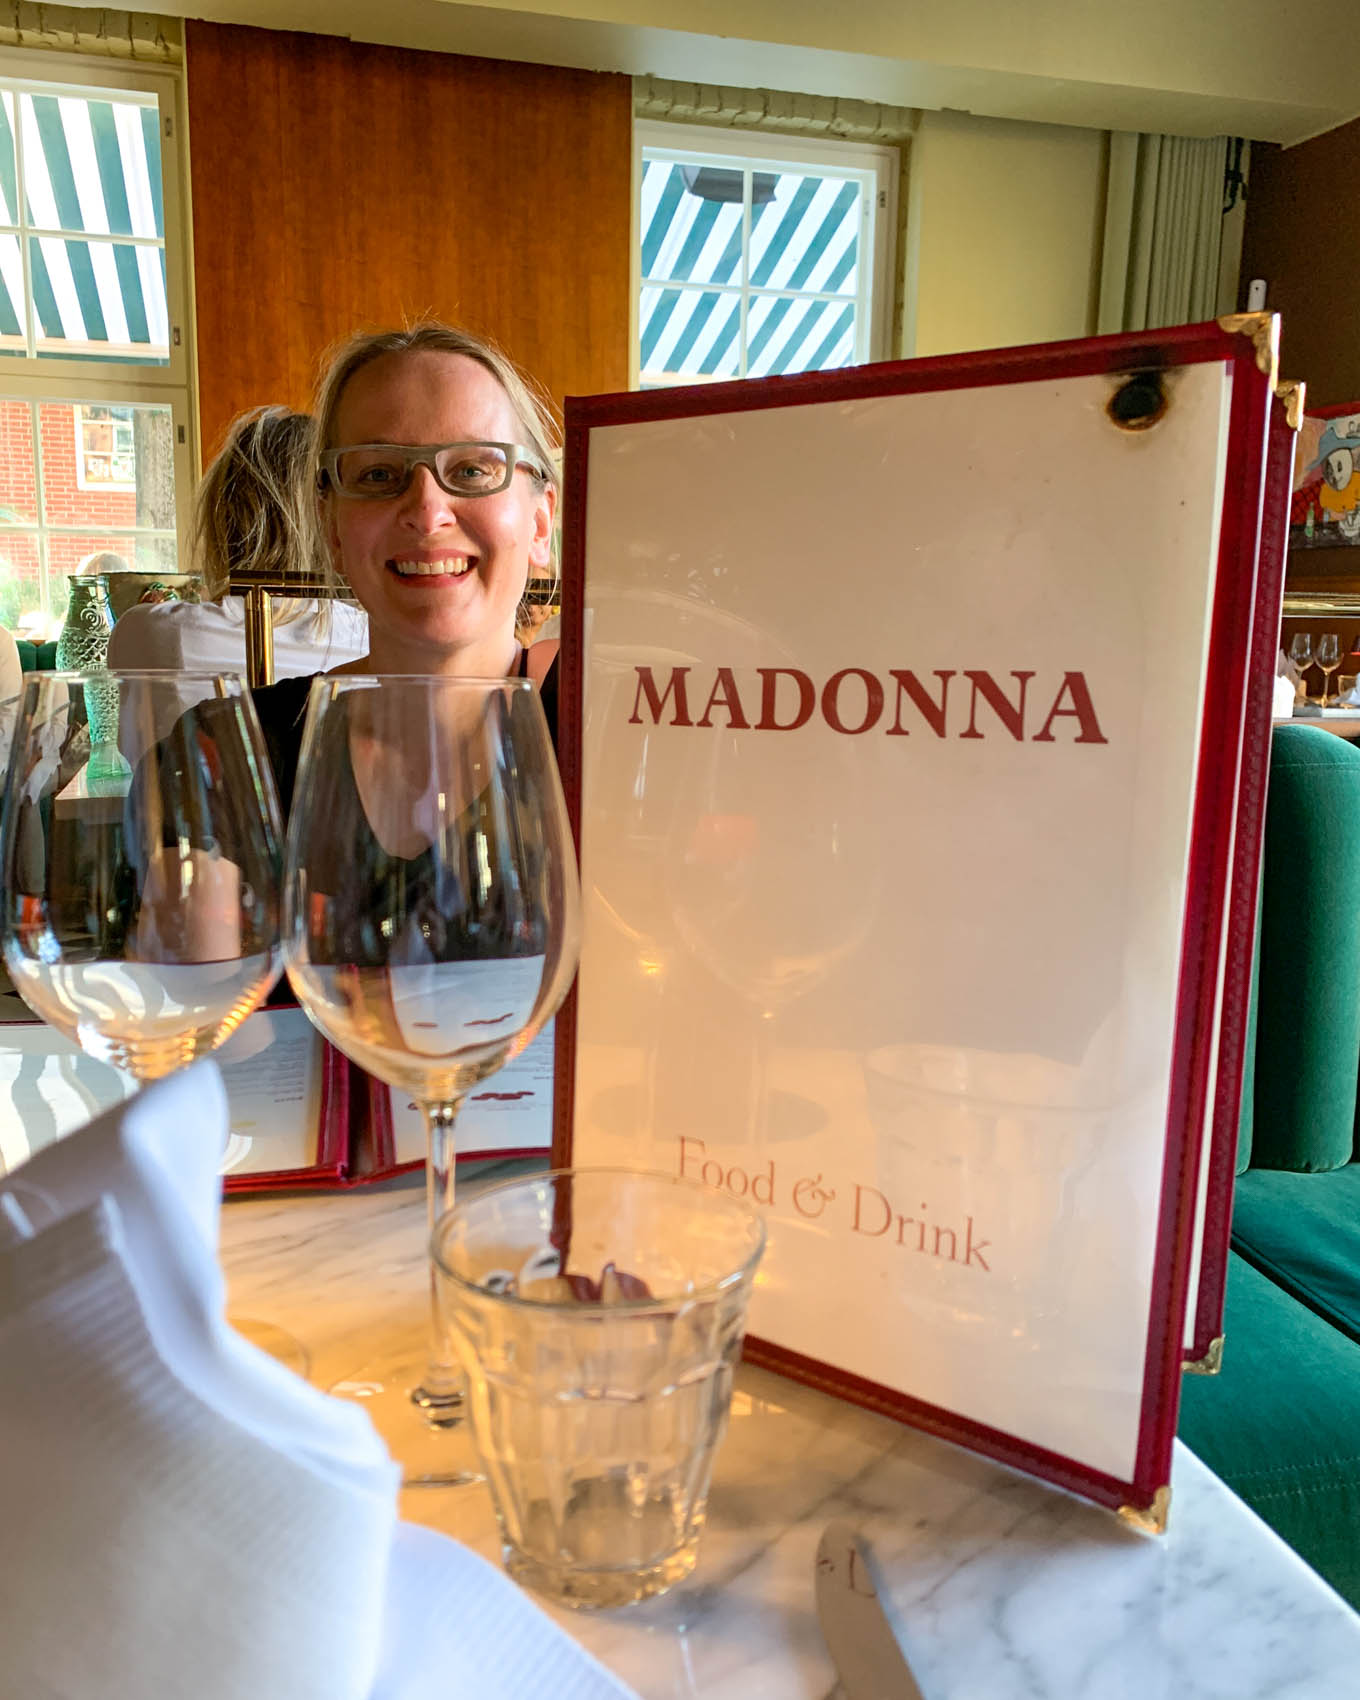 Ravintola Madonna